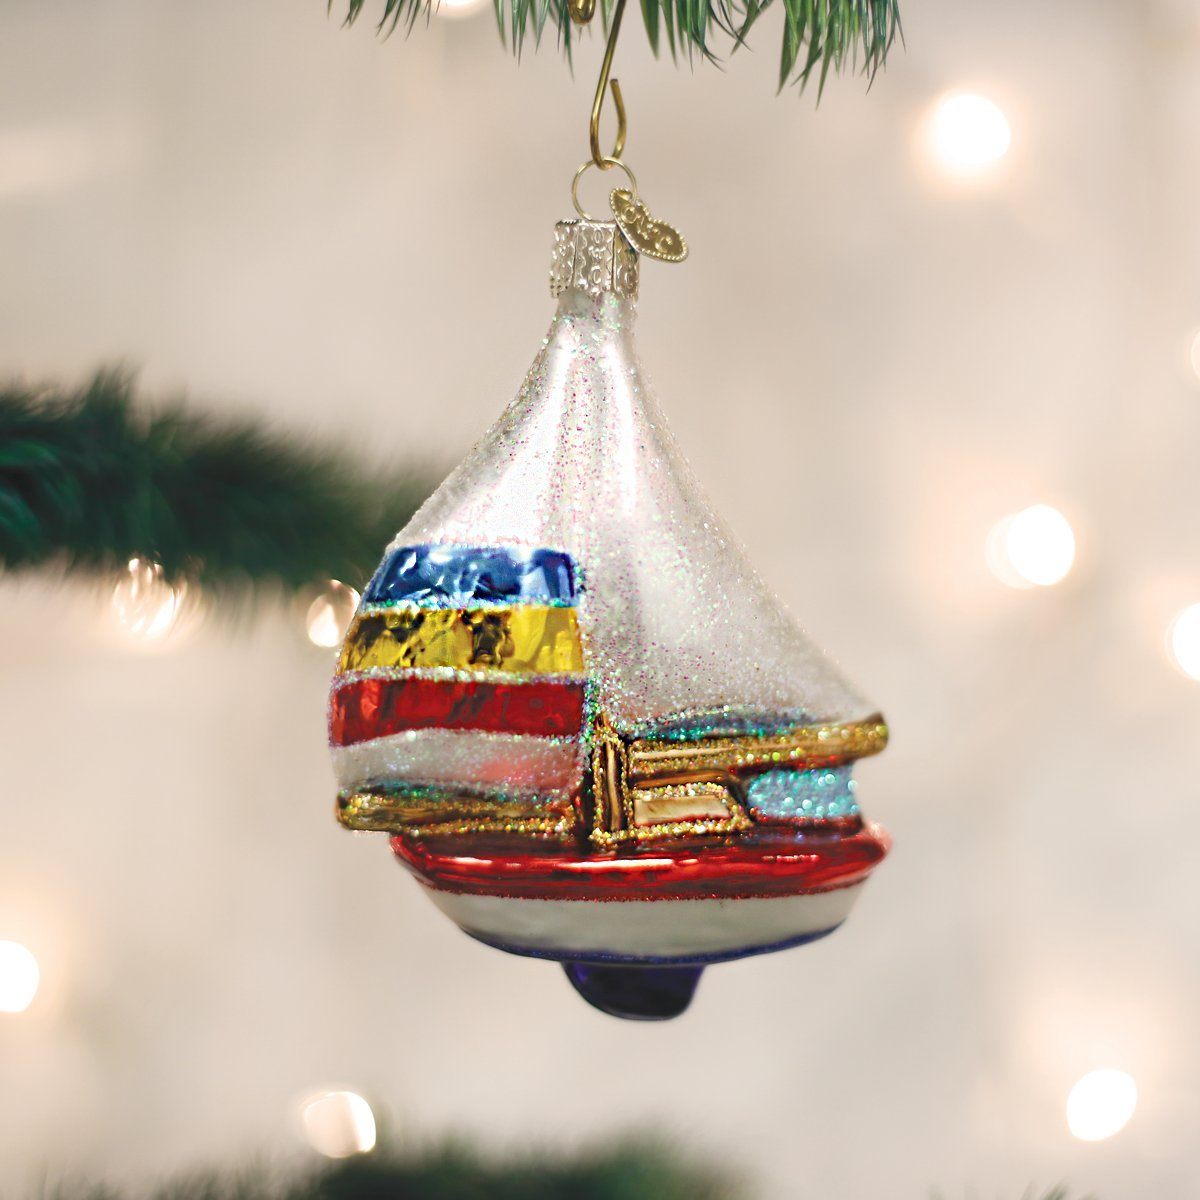 Amazon: Old World Christmas Sailboat Glass Blown Ornament: Home &  Kitchen